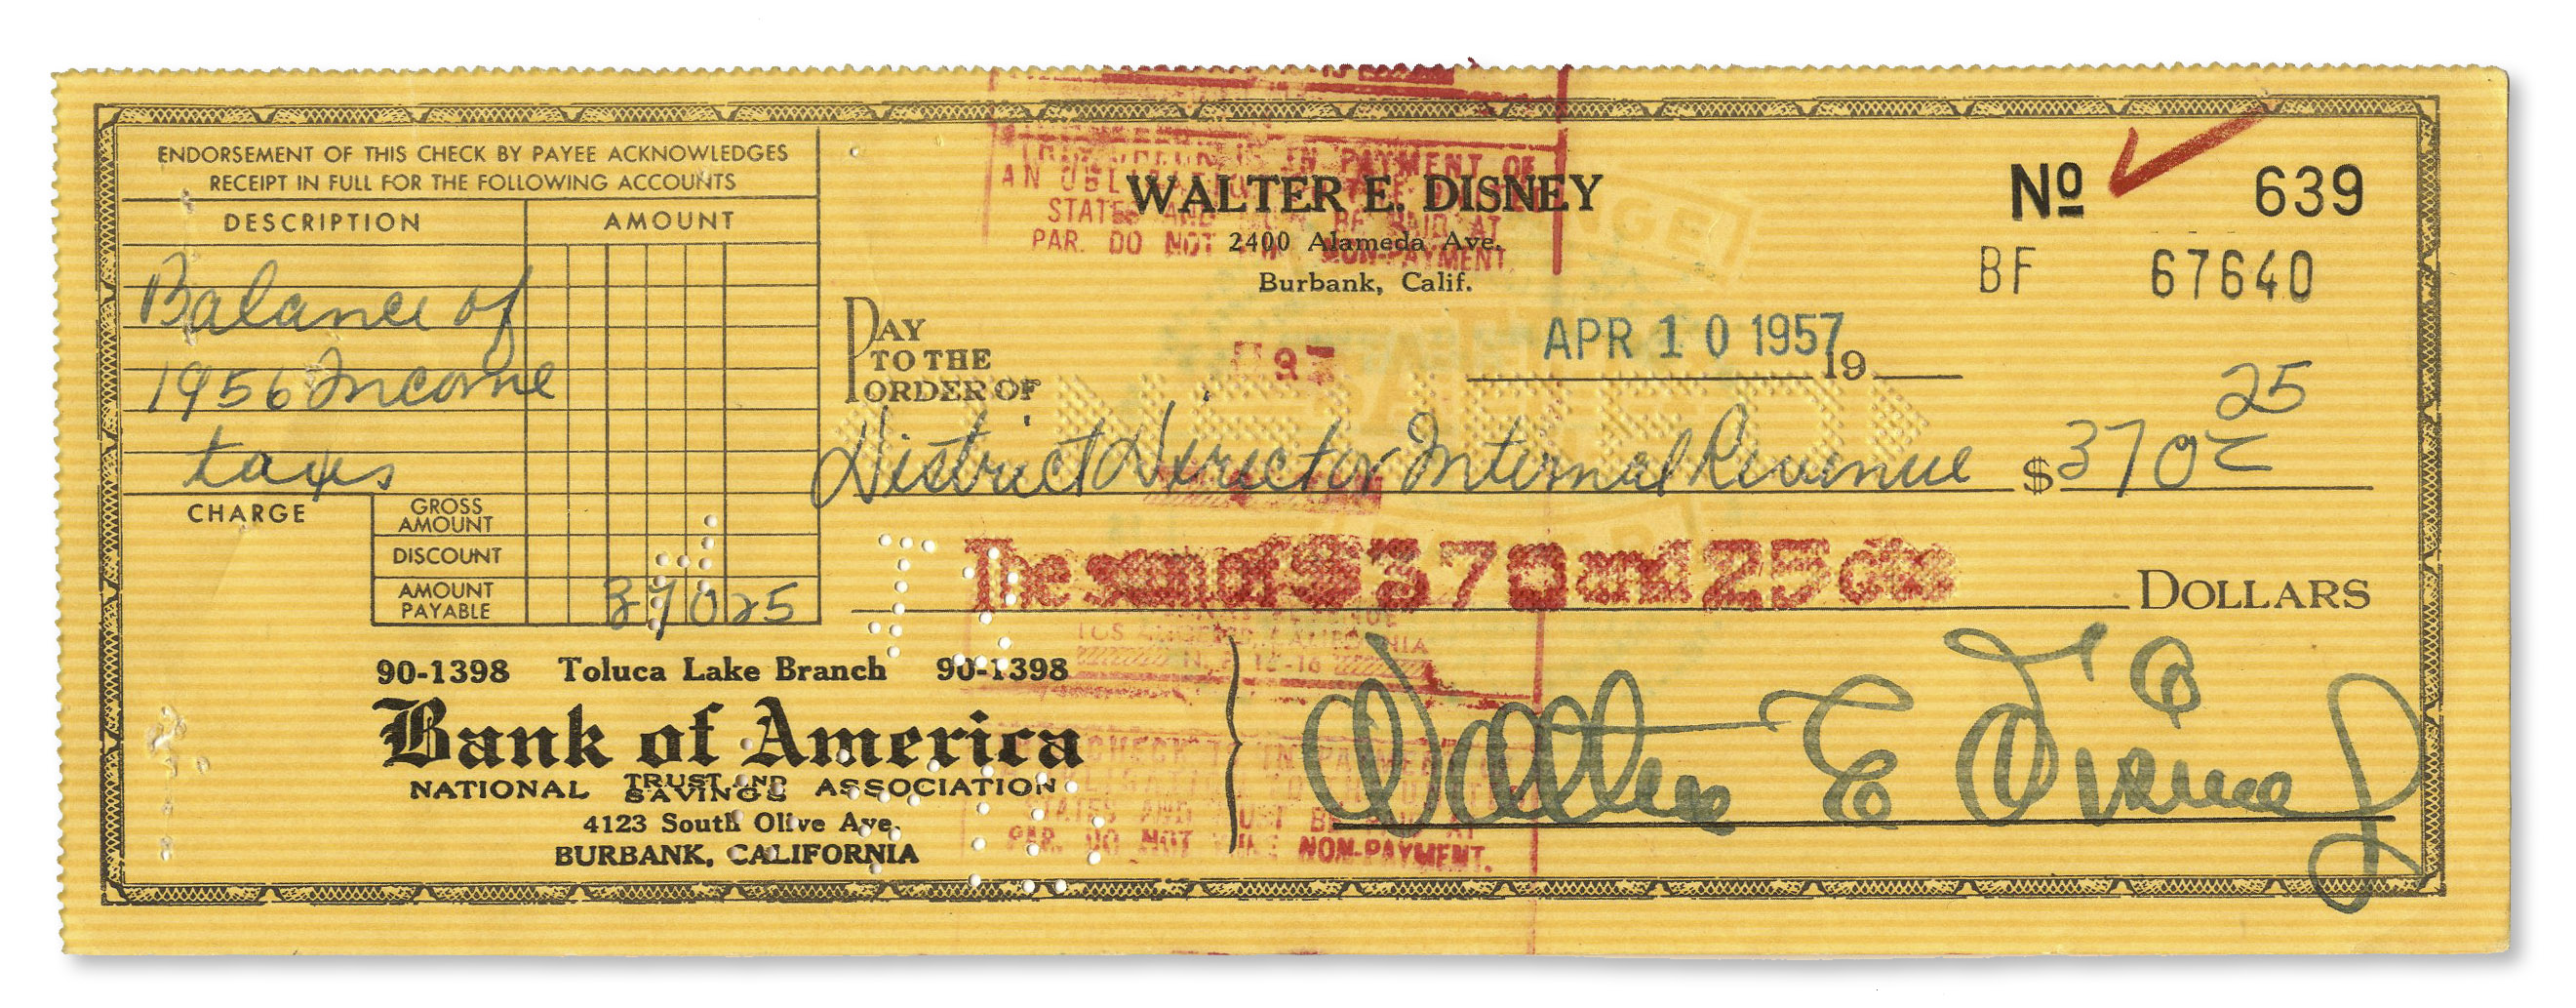 "Walt Disney Autograph Walt Disney Signed Check -- Signed ""Walter E. Disney"" in Famed Disney Handwriting"